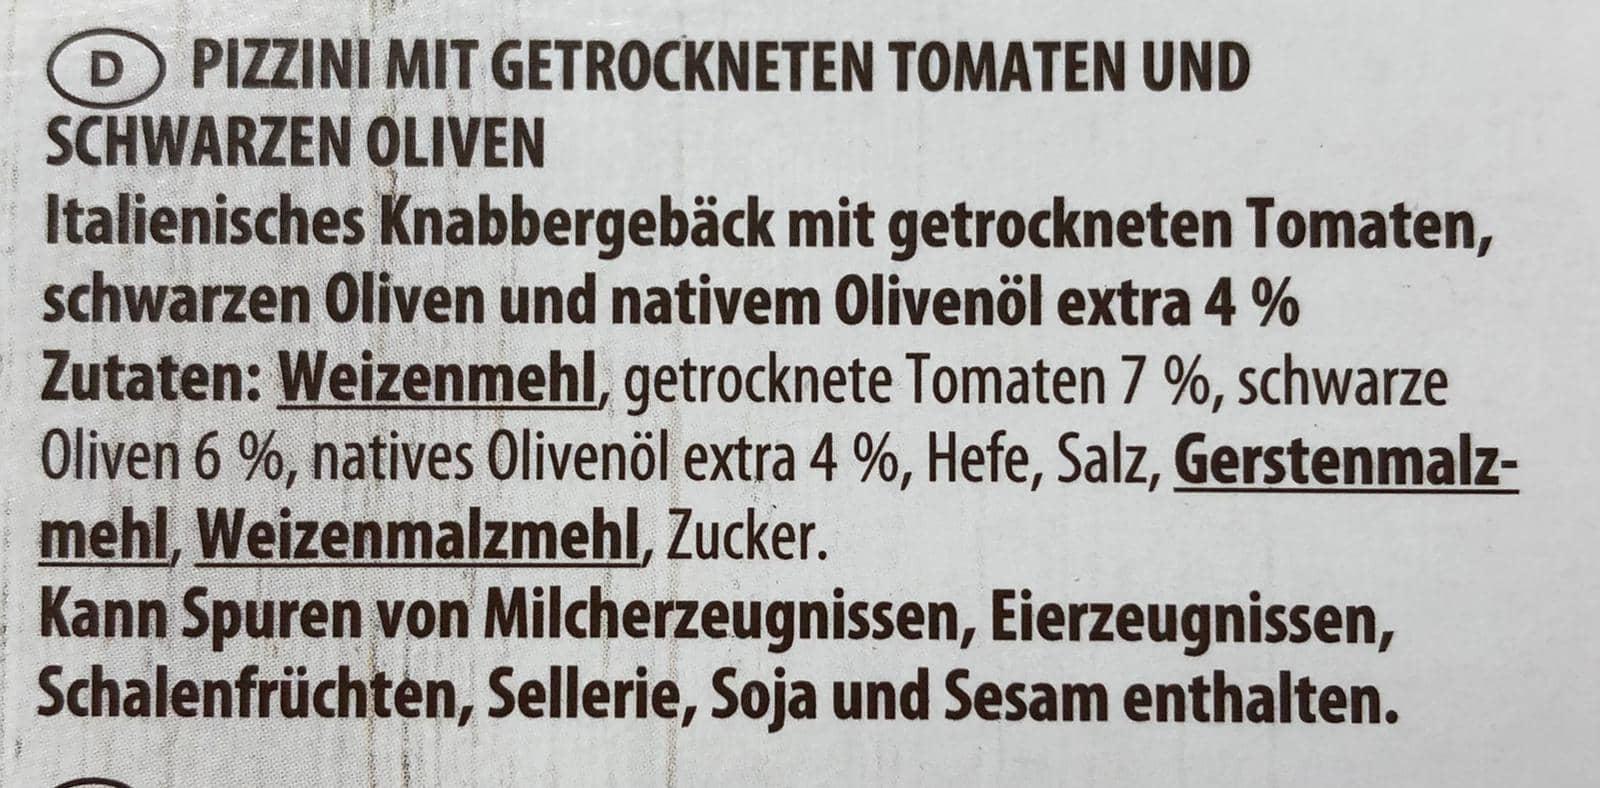 Pizzini Tomate und schwarze Oliven 100g